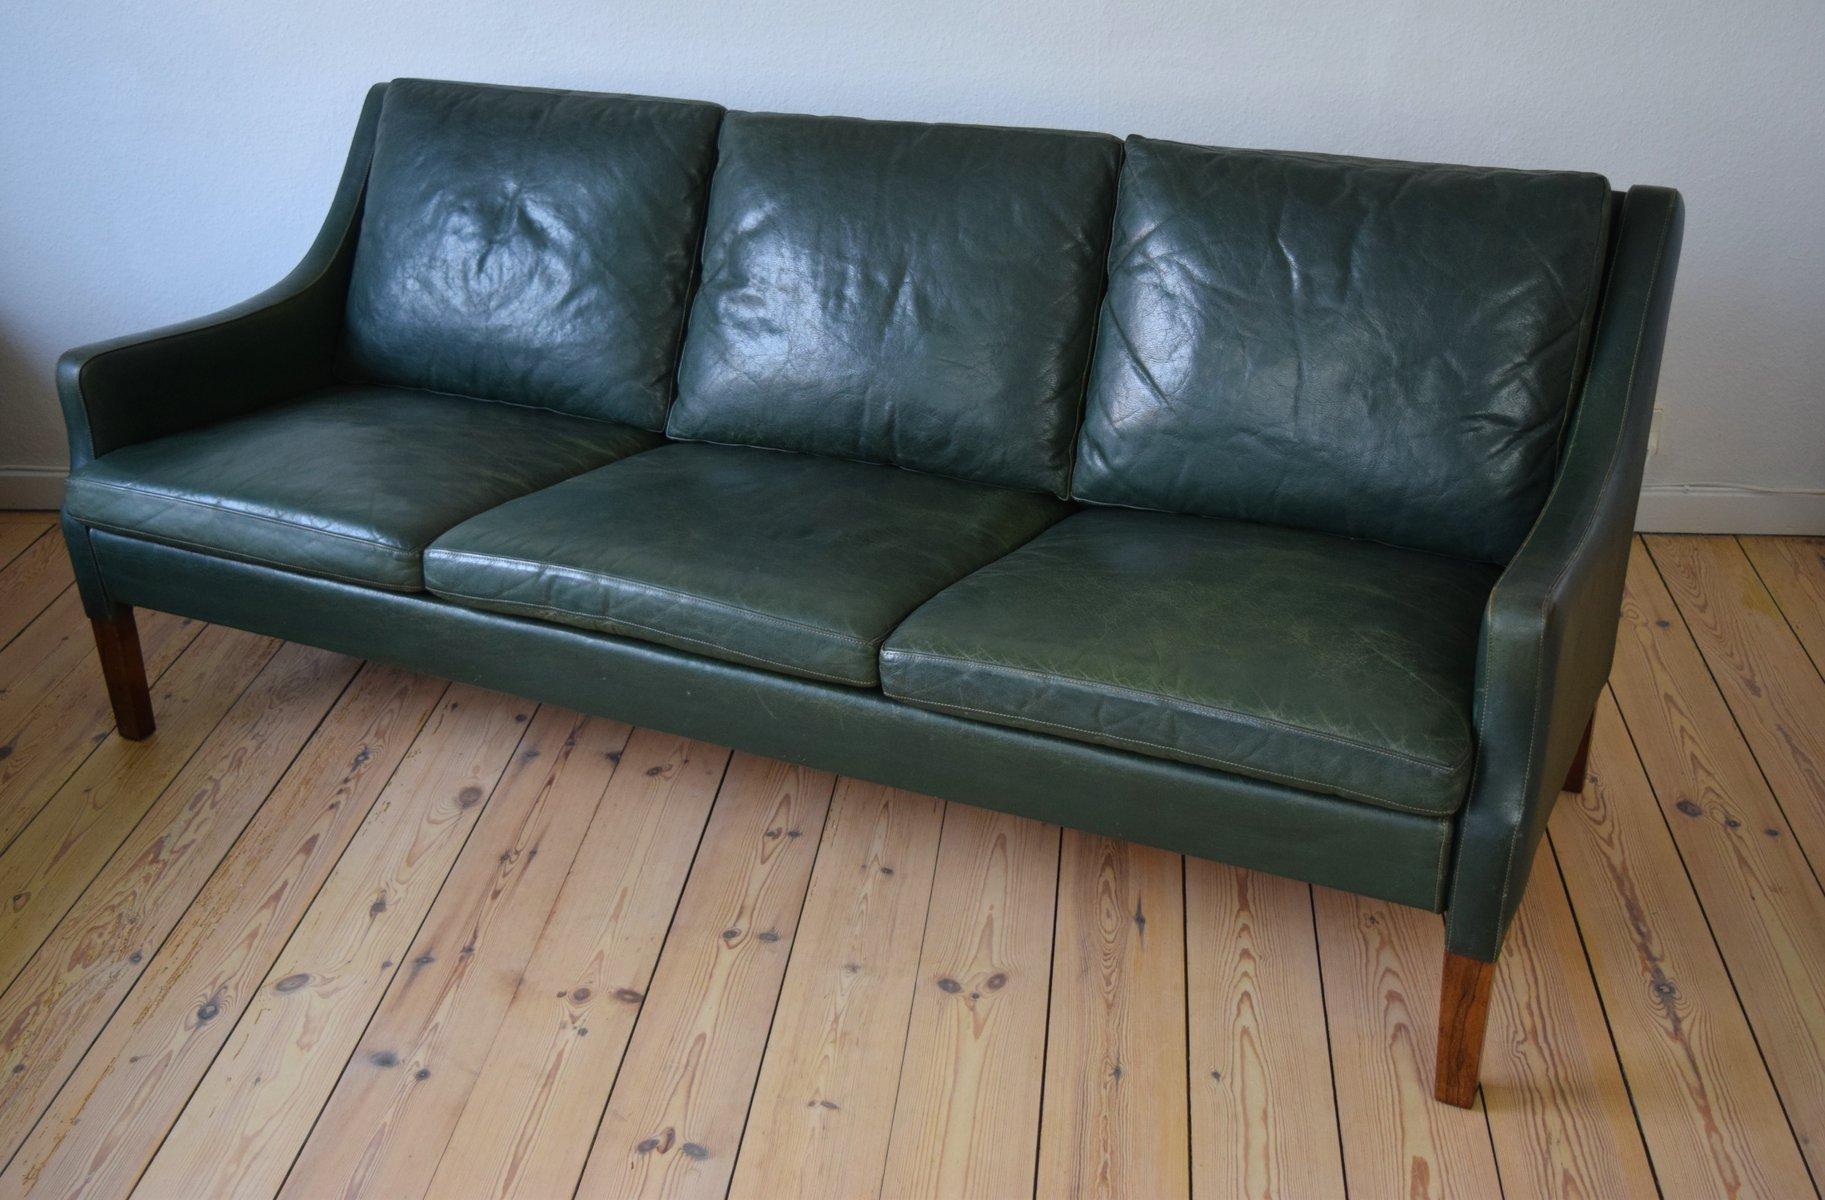 Vintage Danish Green Leather Sofa by Rud Thygesen for Vejen